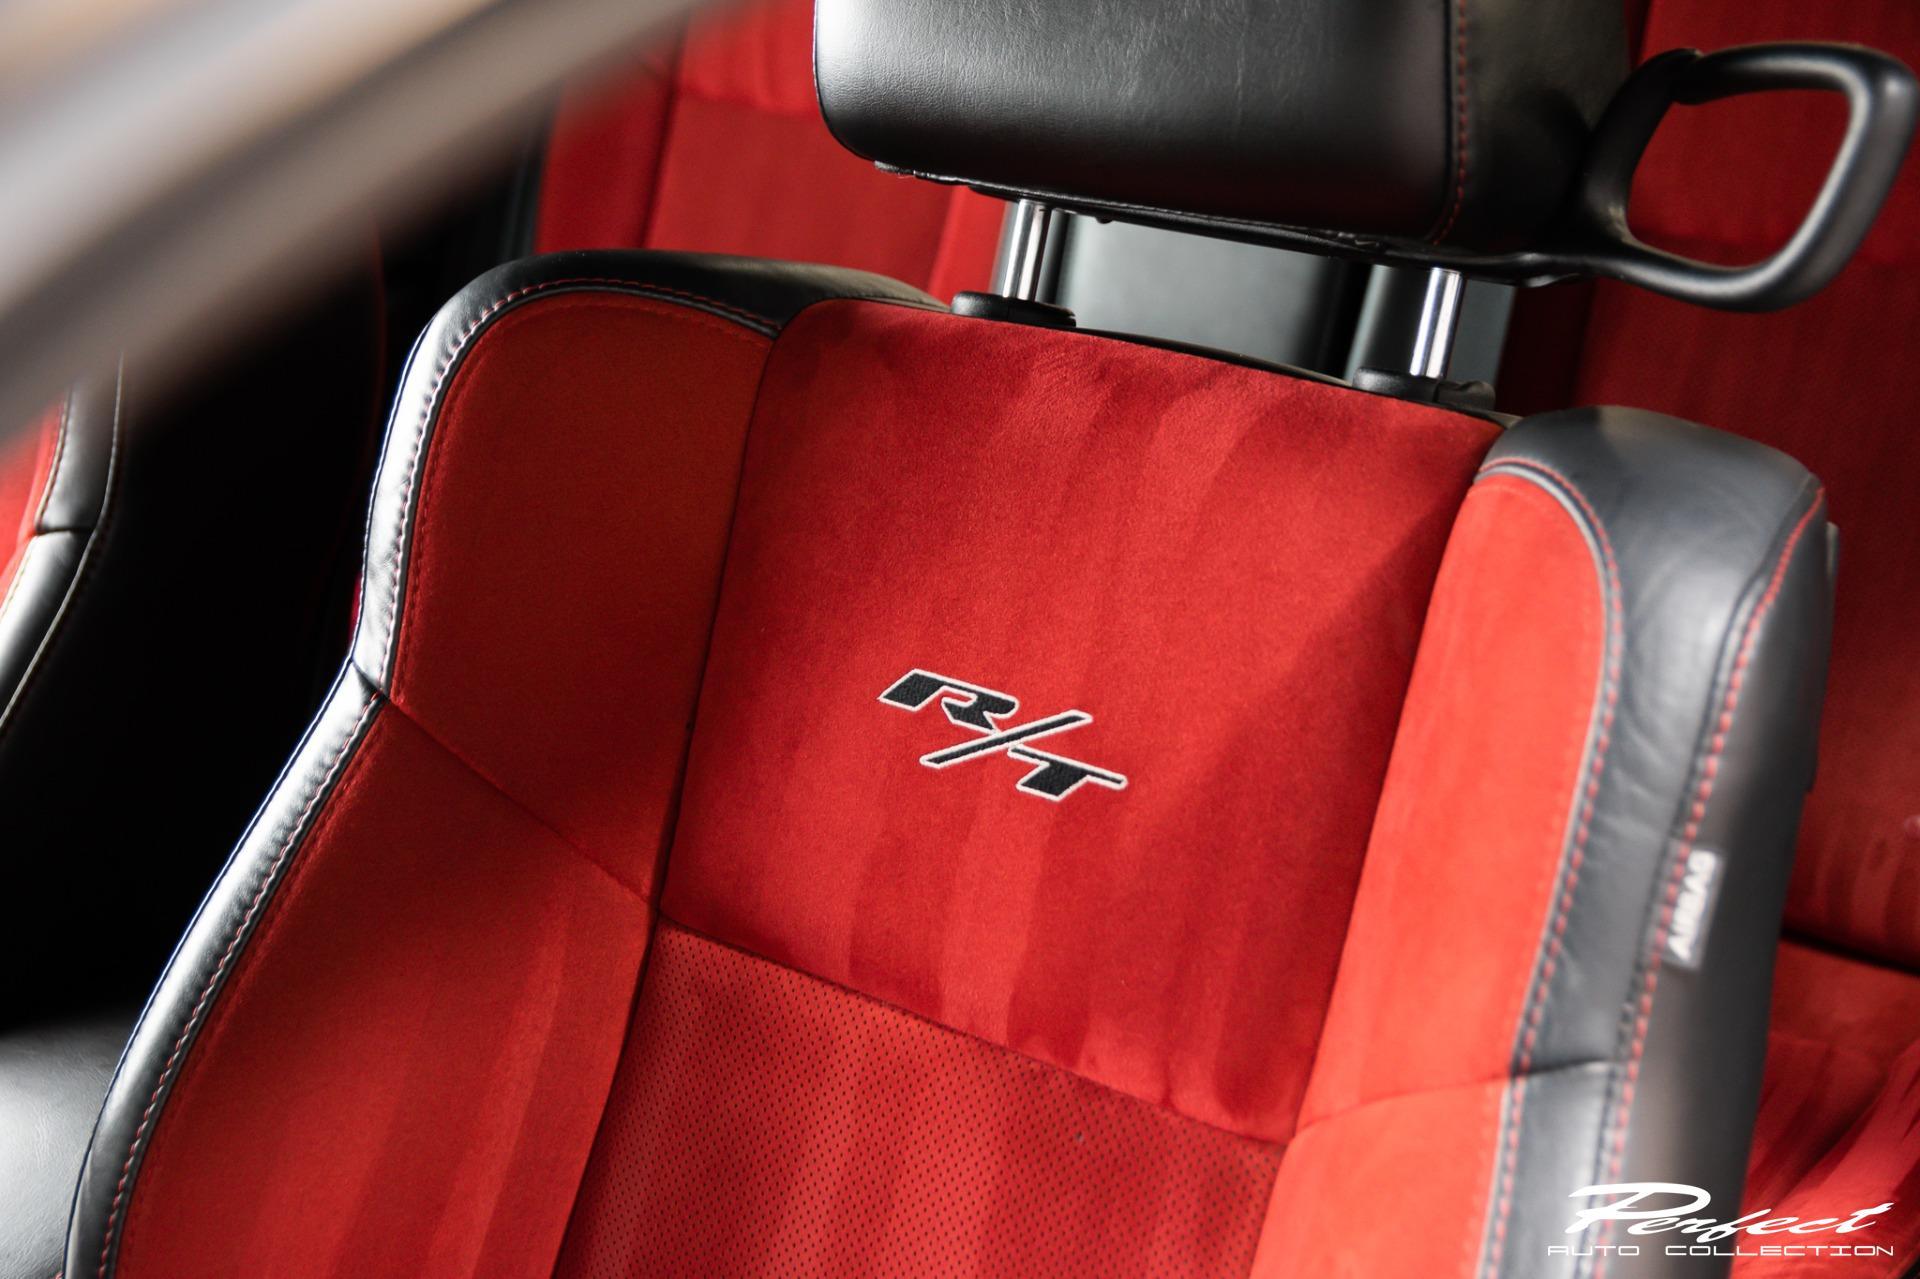 Used 2016 Dodge Challenger RT Plus